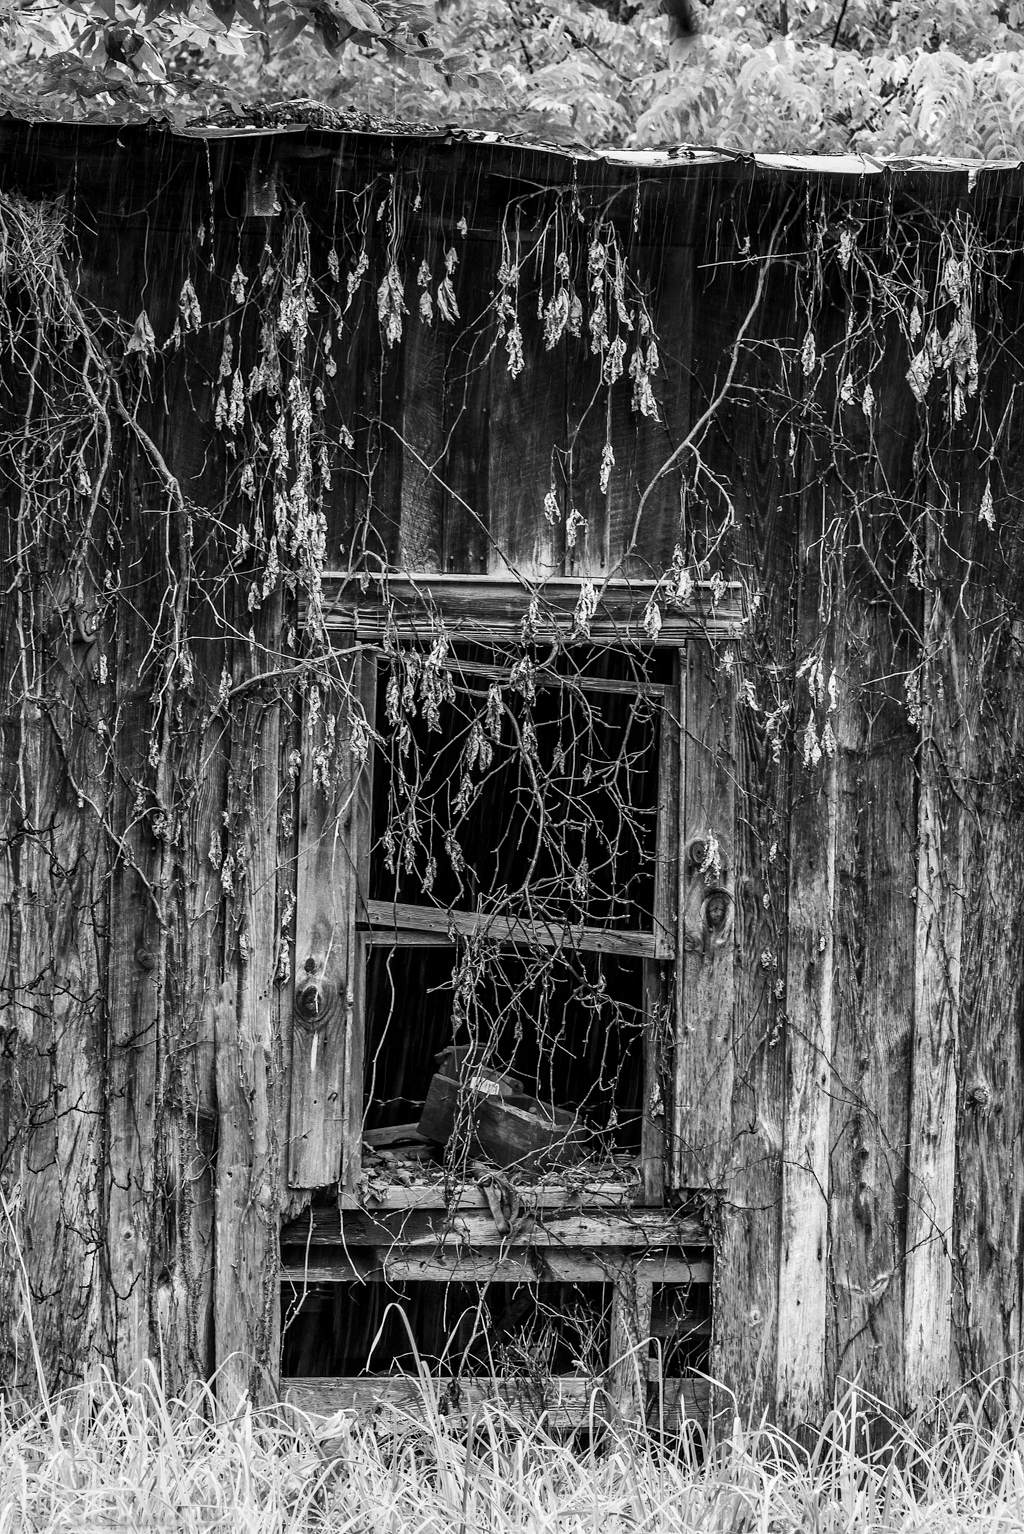 Old Jackson Barn Window Composition